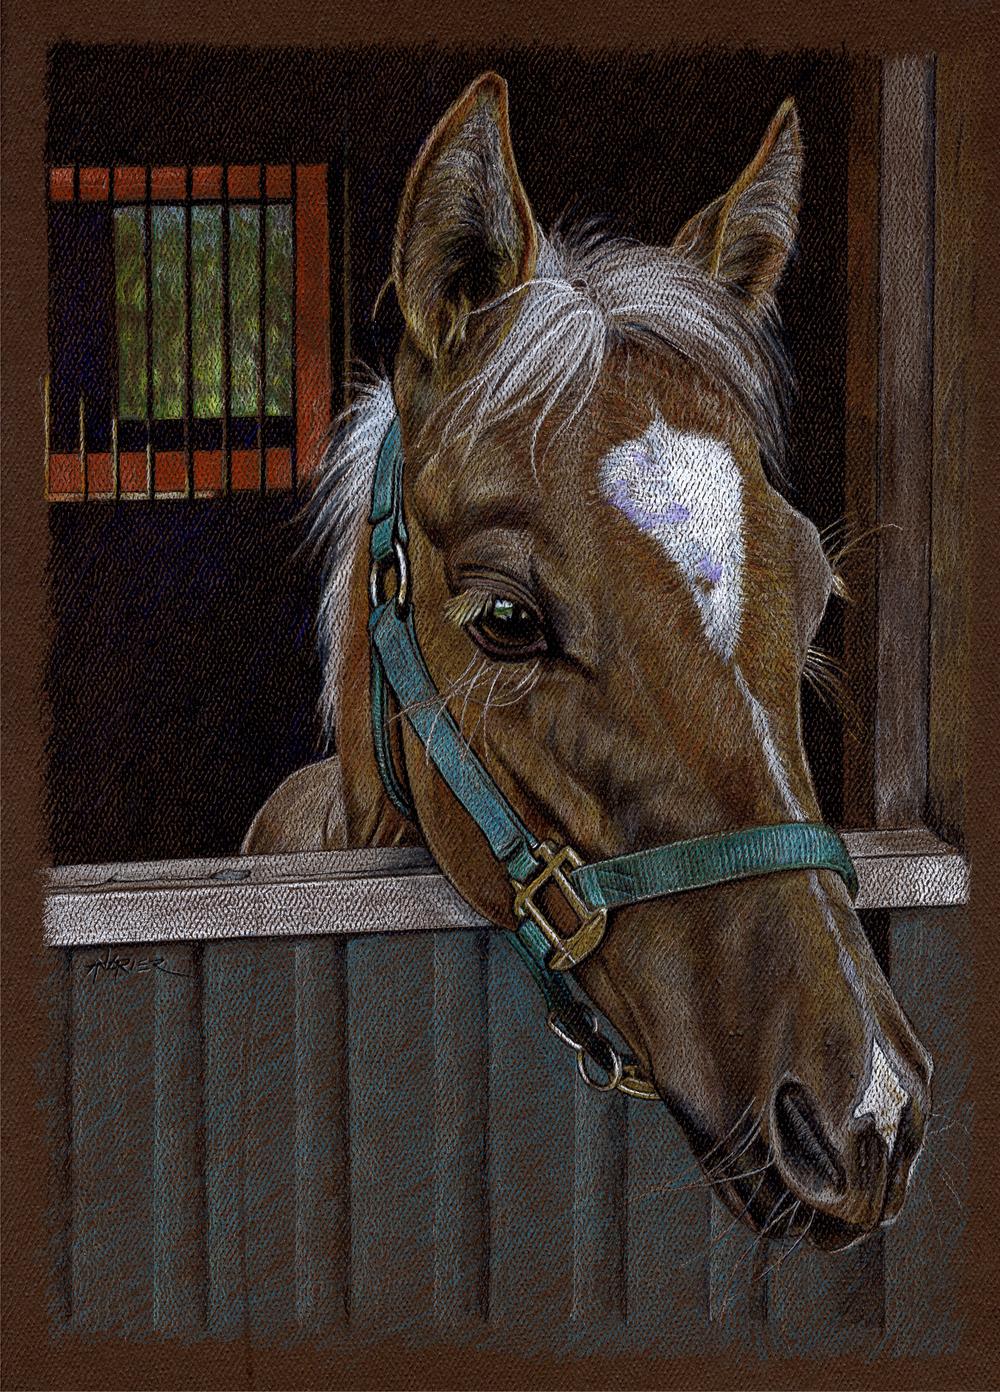 Horse_zpsbeb163d6.JPG